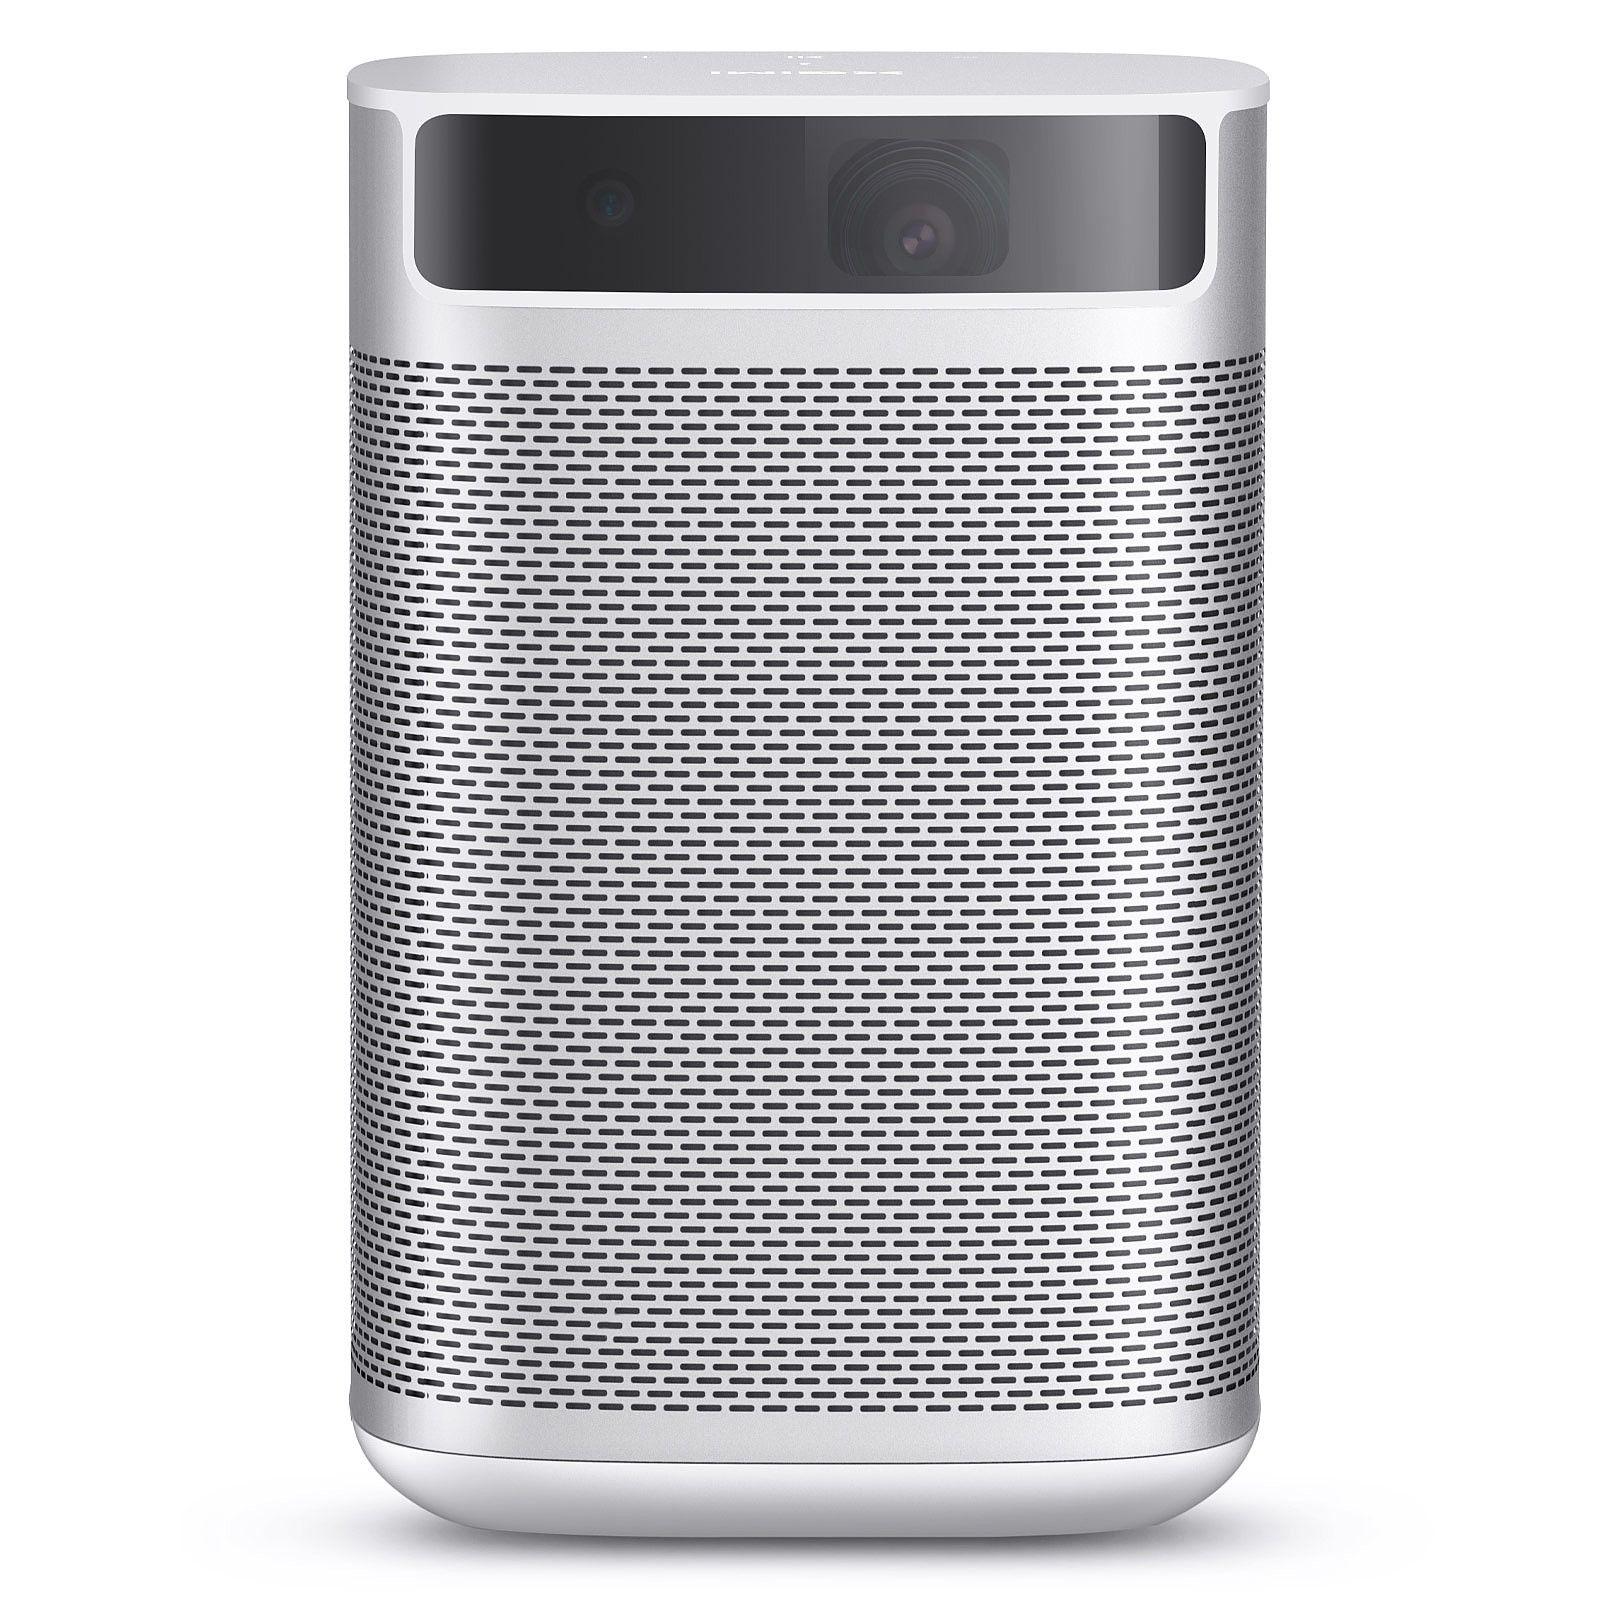 XGIMI Mogo Pro: Tragbarer Mini-Beamer (1080P Nativ Auflösung, 300ANSI Lumen, Harman/Kardon Lautsprecher, Android TV, 4h Akku)